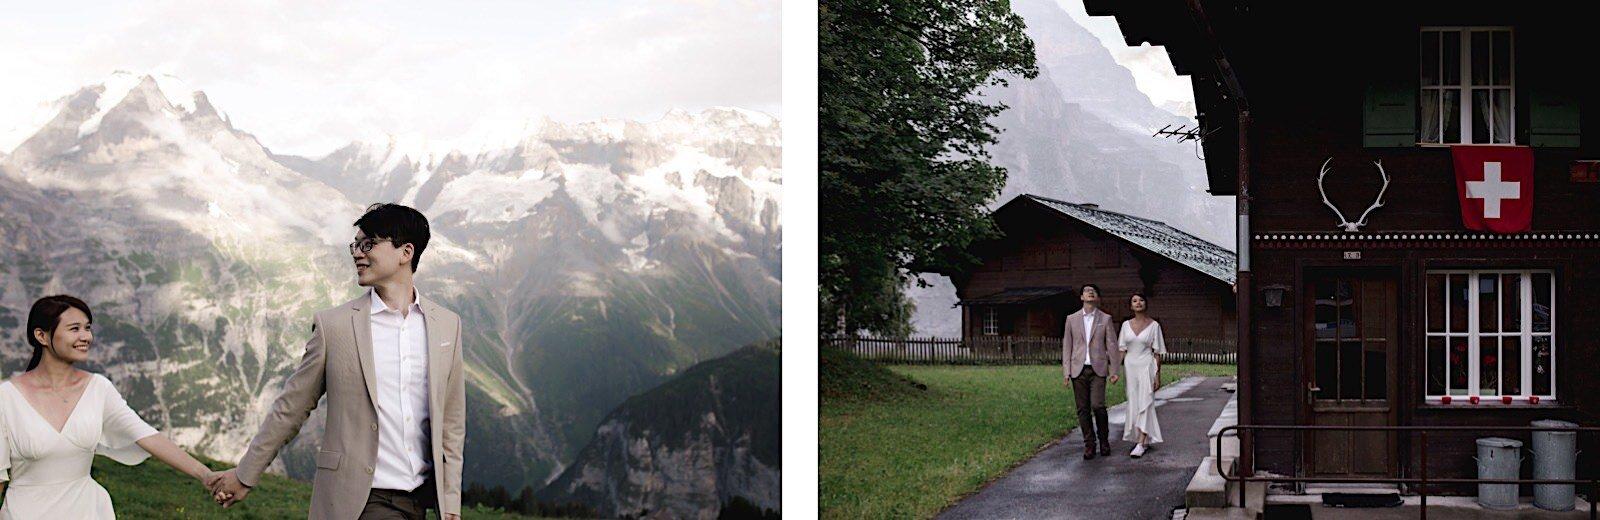 Swiss Alps Photographer Murren Fotomagoria 30.jpg